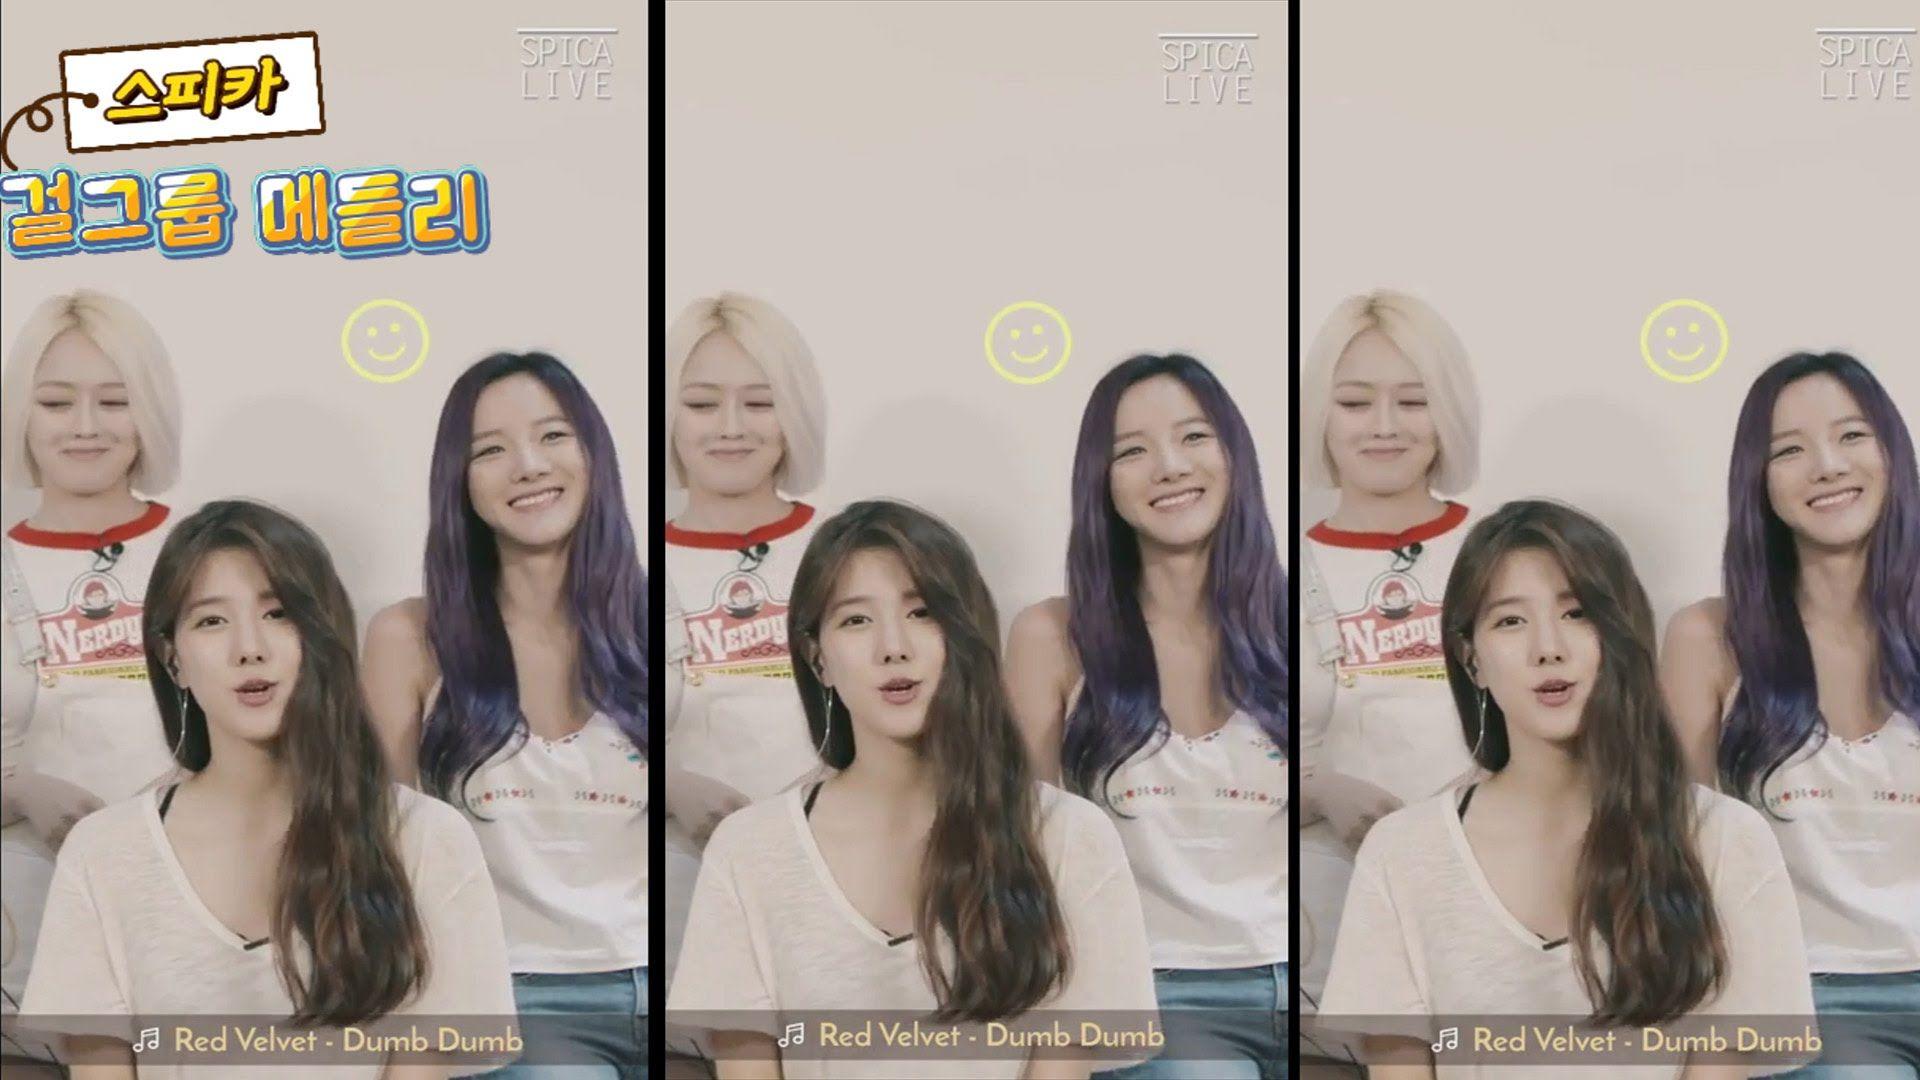 SPICA(스피카) 'K-POP Girl Group Medley'(걸그룹 메들리) Video 공개 (시크릿 타임, Secert T...